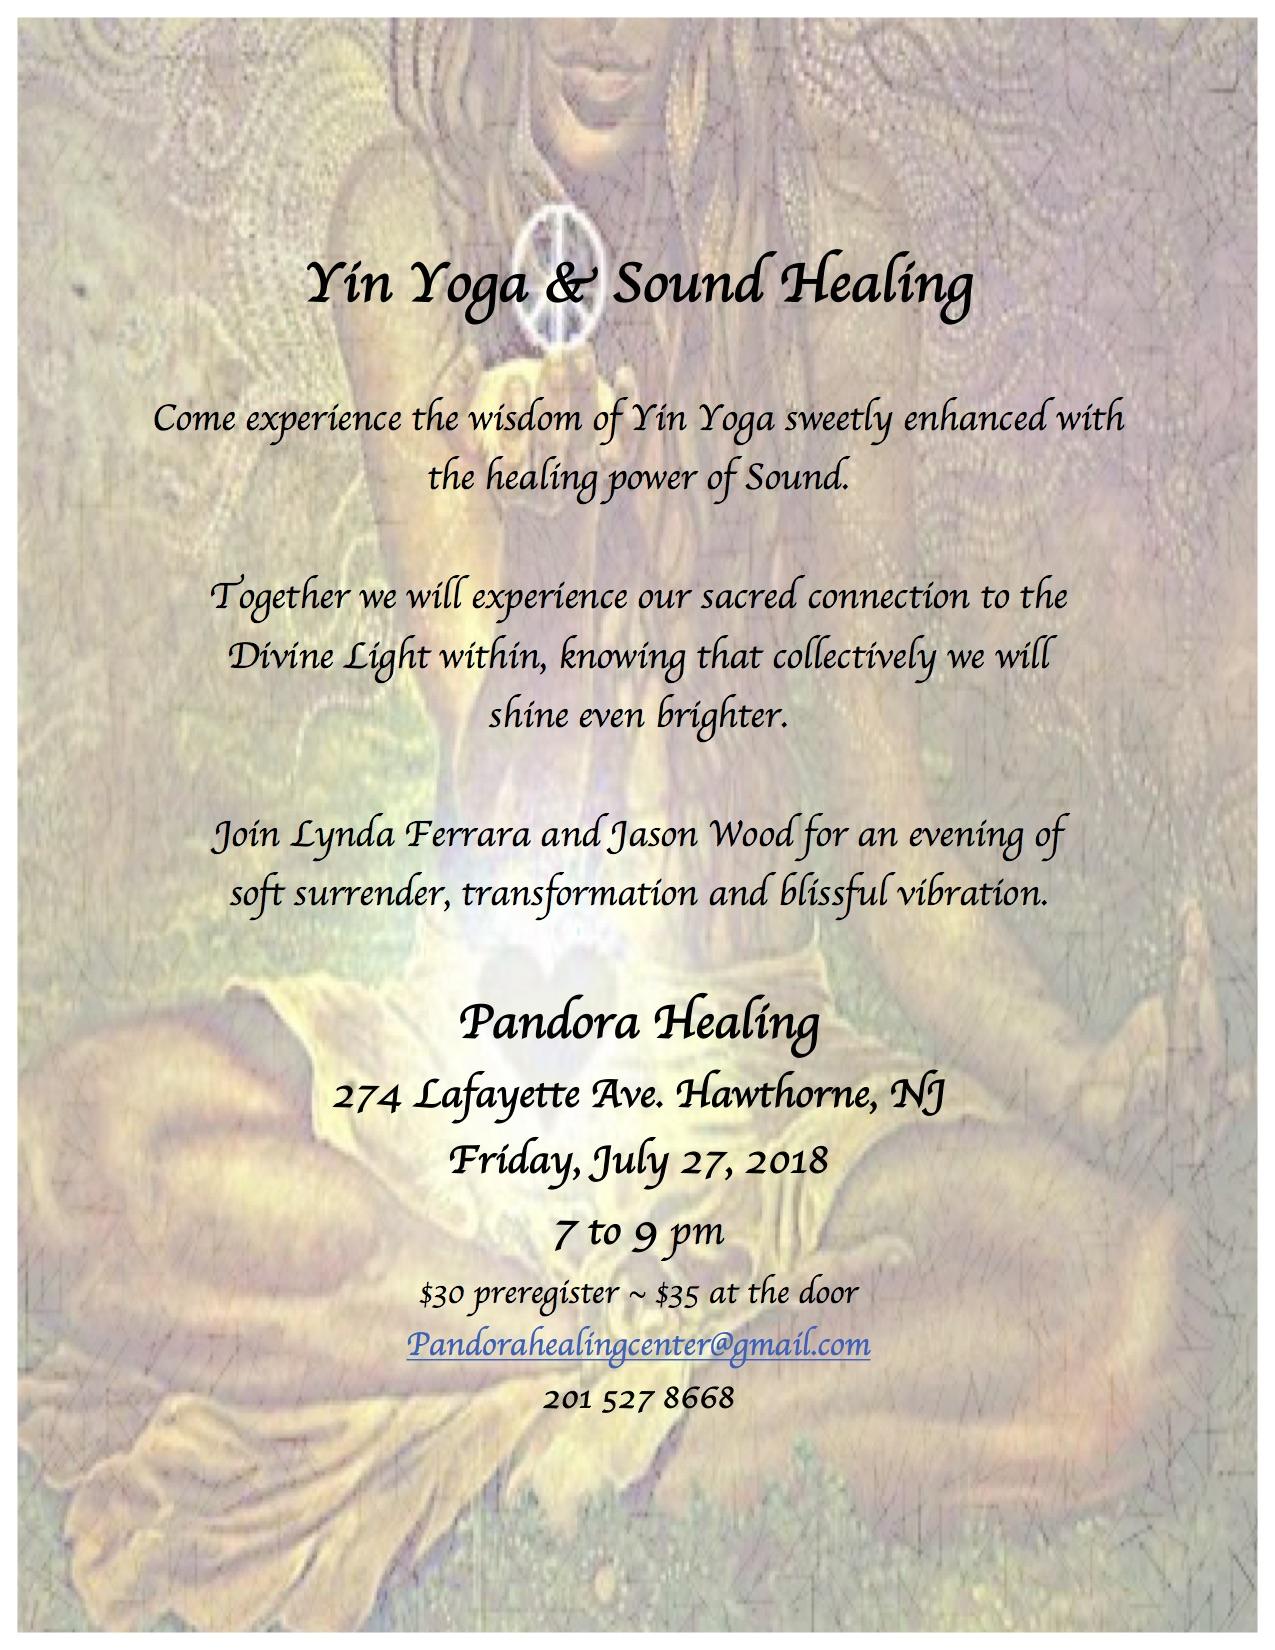 Yin Yoga Jul 2018.jpg